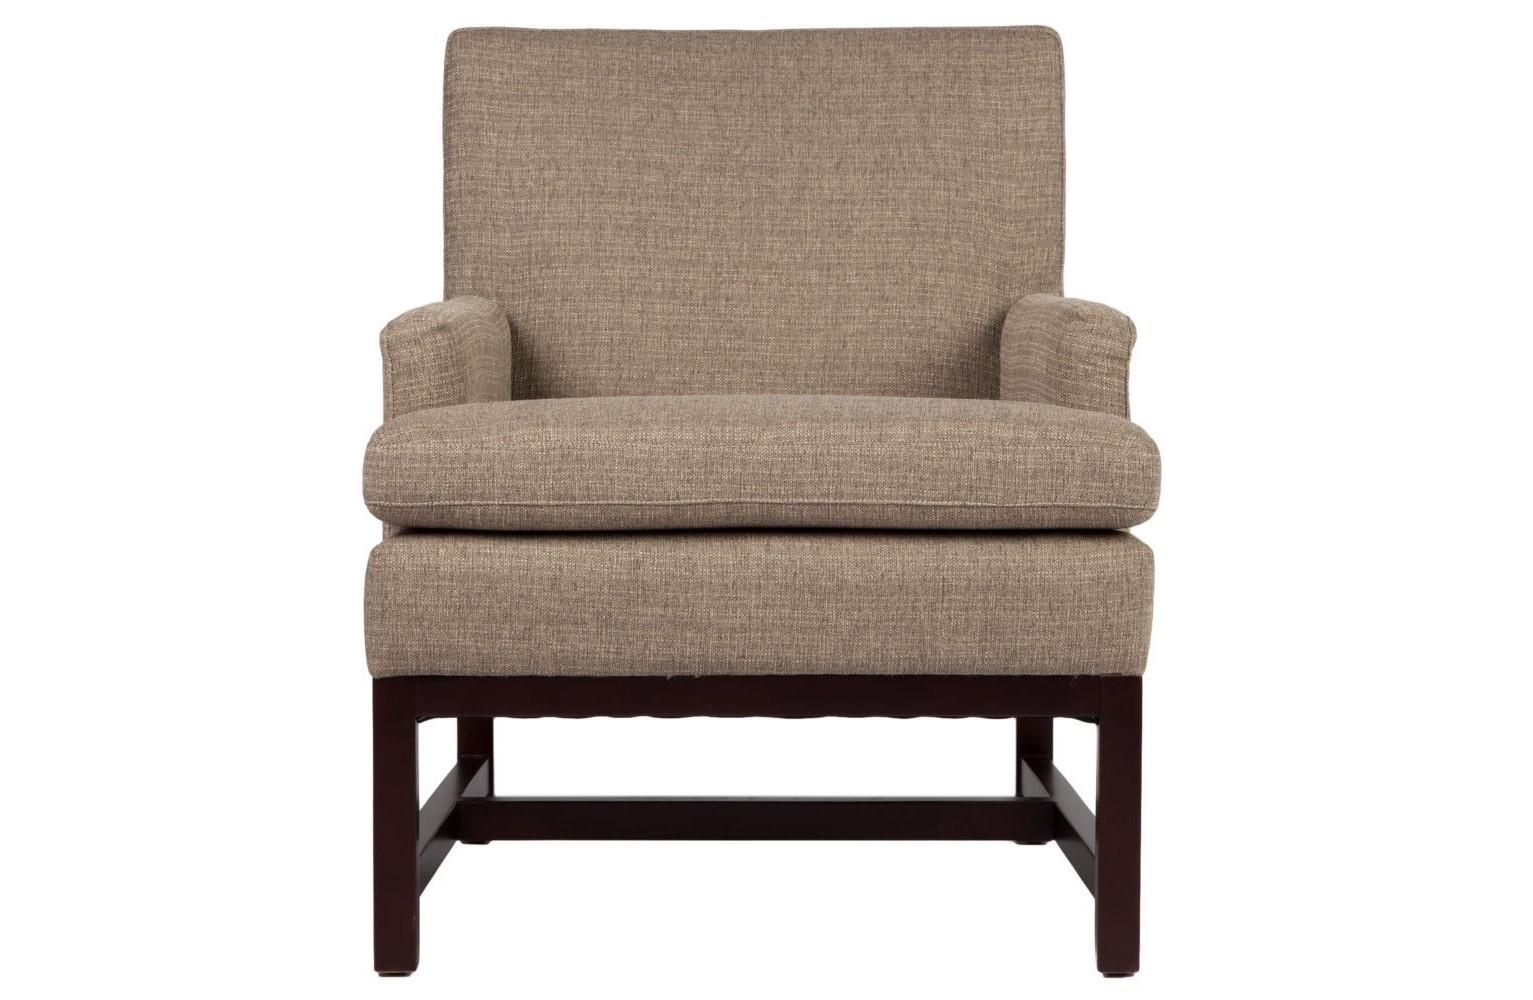 КреслоИнтерьерные кресла<br><br><br>Material: Текстиль<br>Width см: 65<br>Depth см: 78<br>Height см: 82